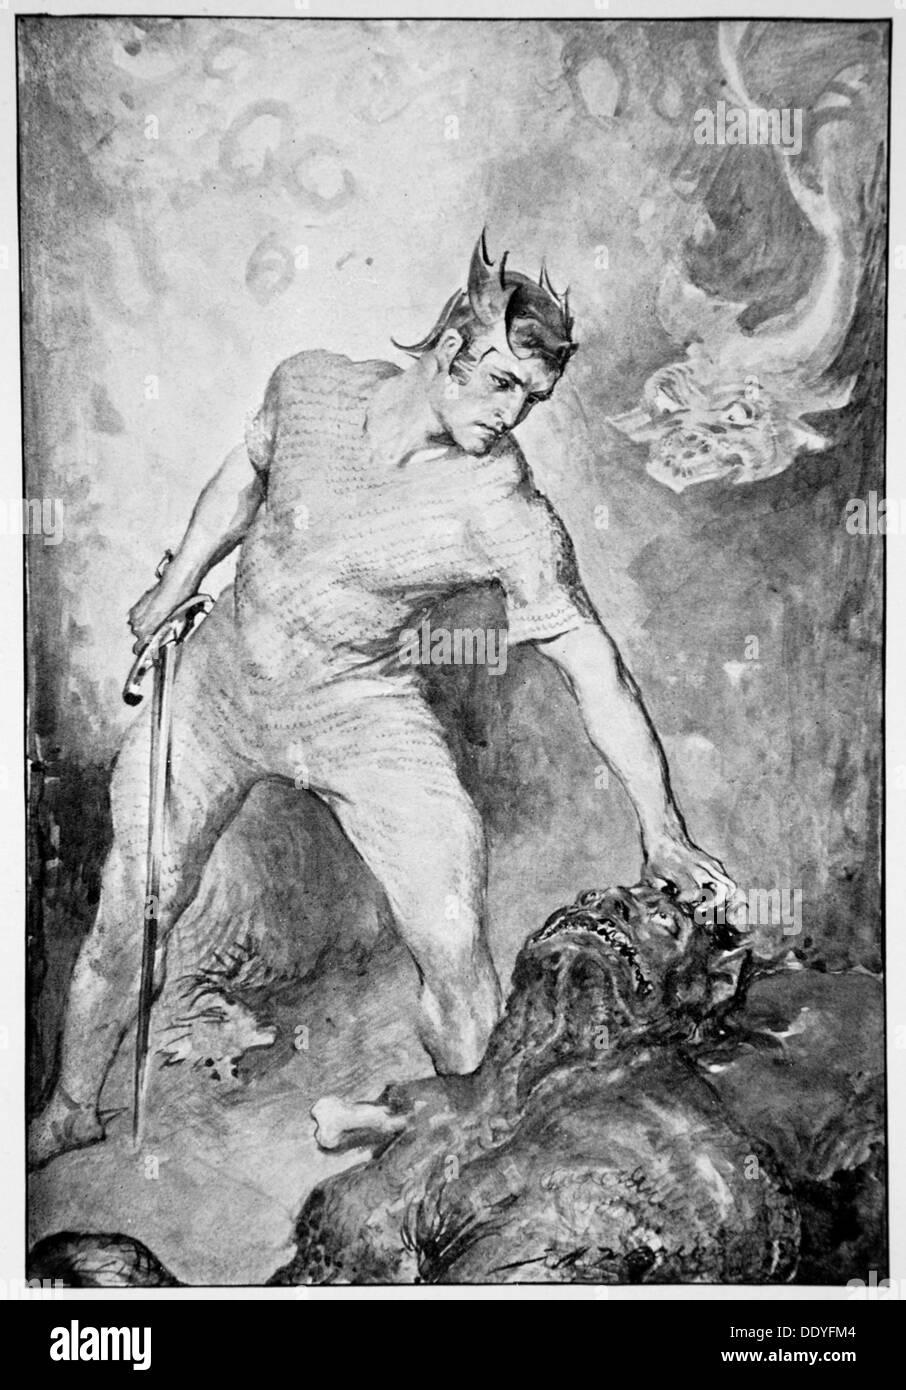 'Beowulf shears off the head of Grendel', 1910.  Artist: John Henry Frederick Bacon - Stock Image